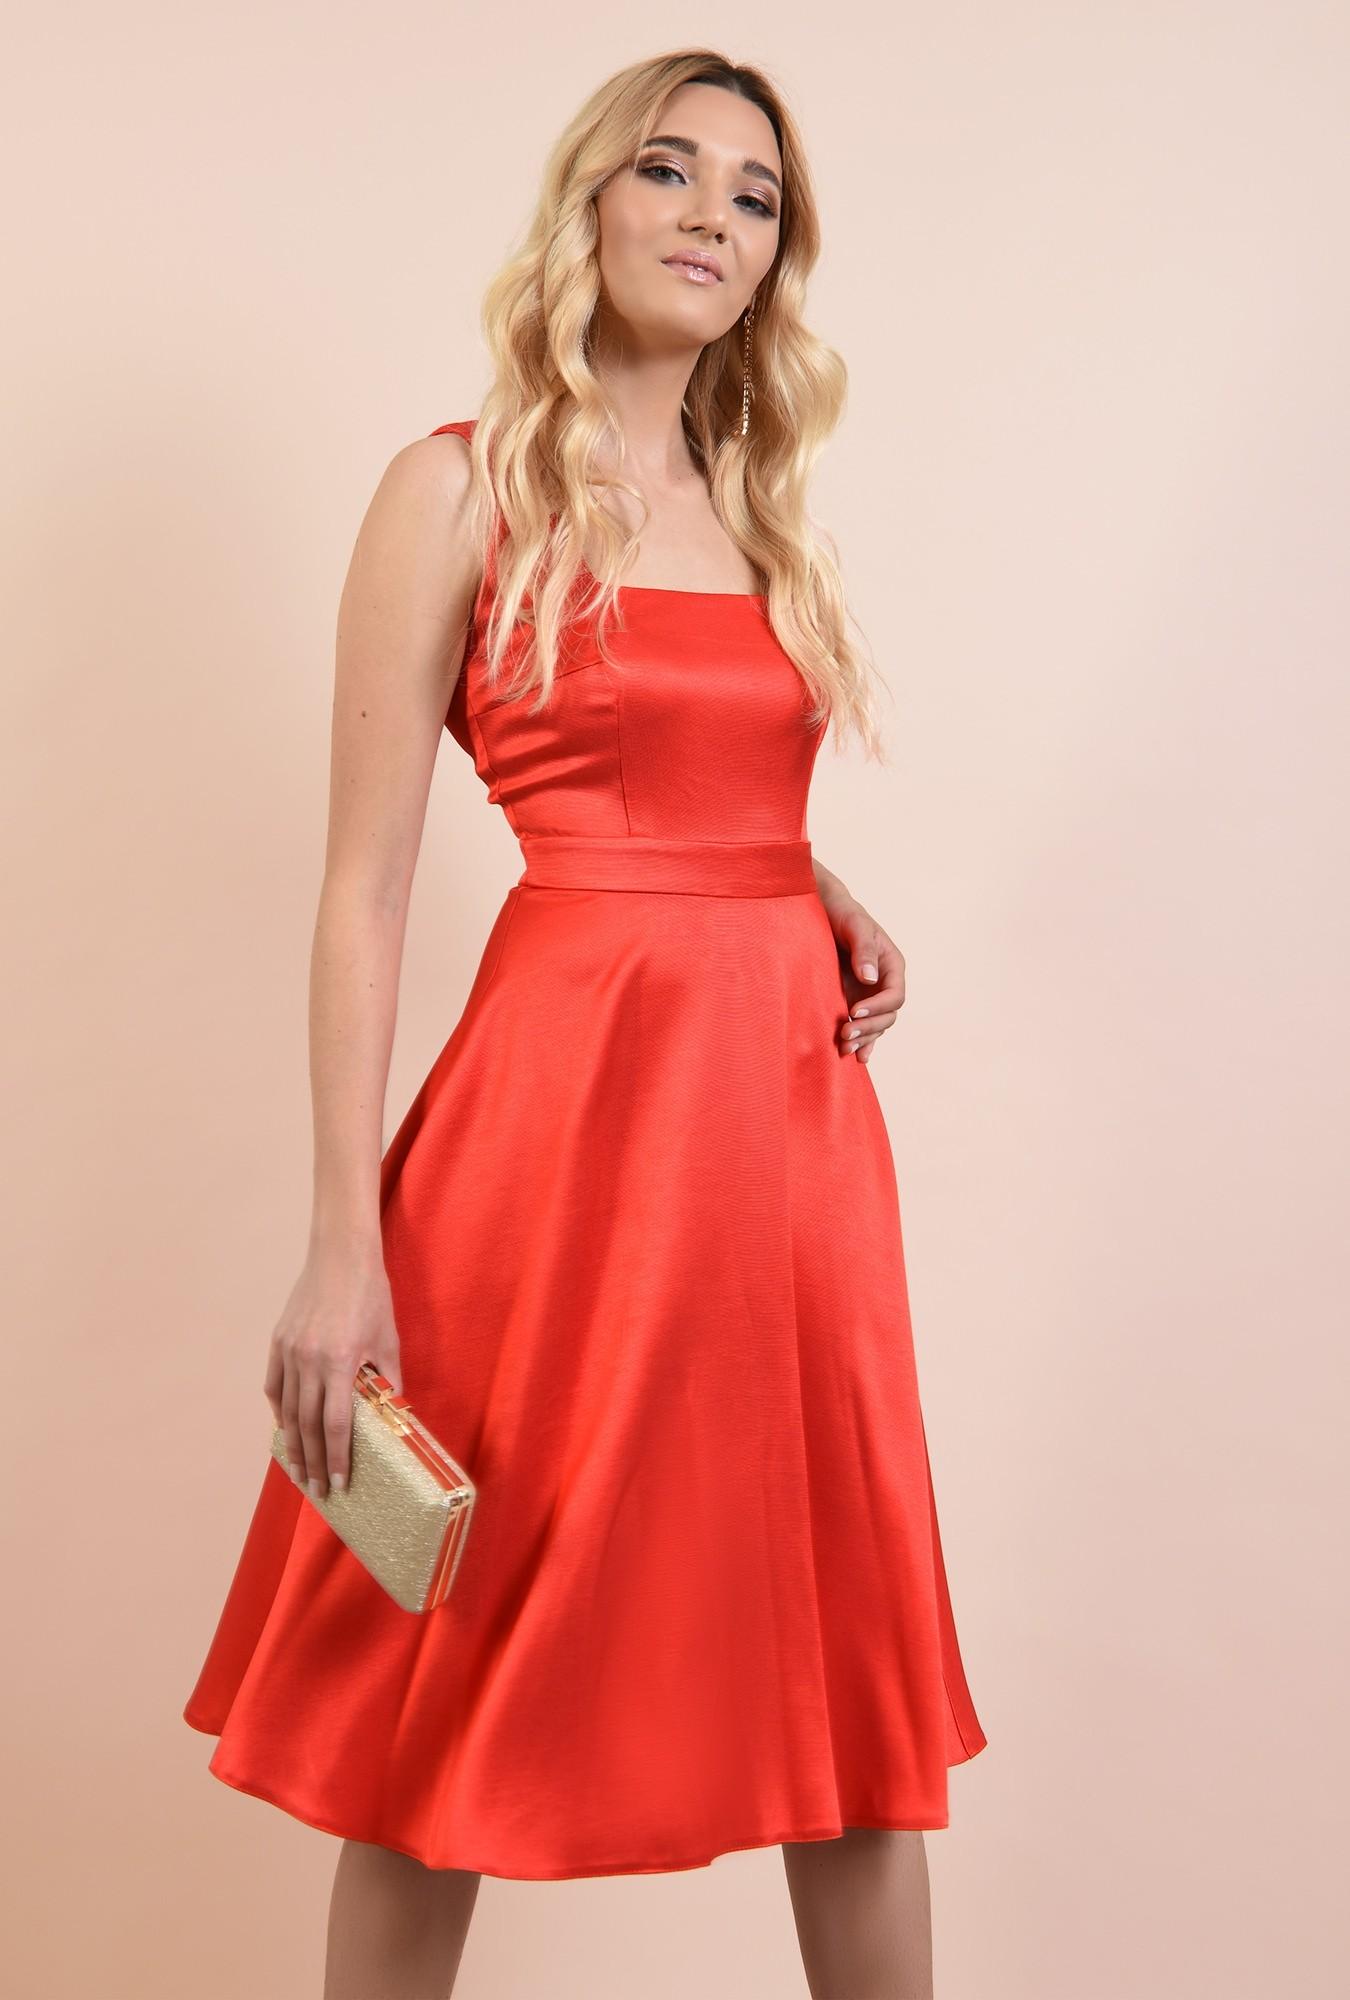 rochie de ocazie, Poema, corai, cu bretele, evazata, rochii online